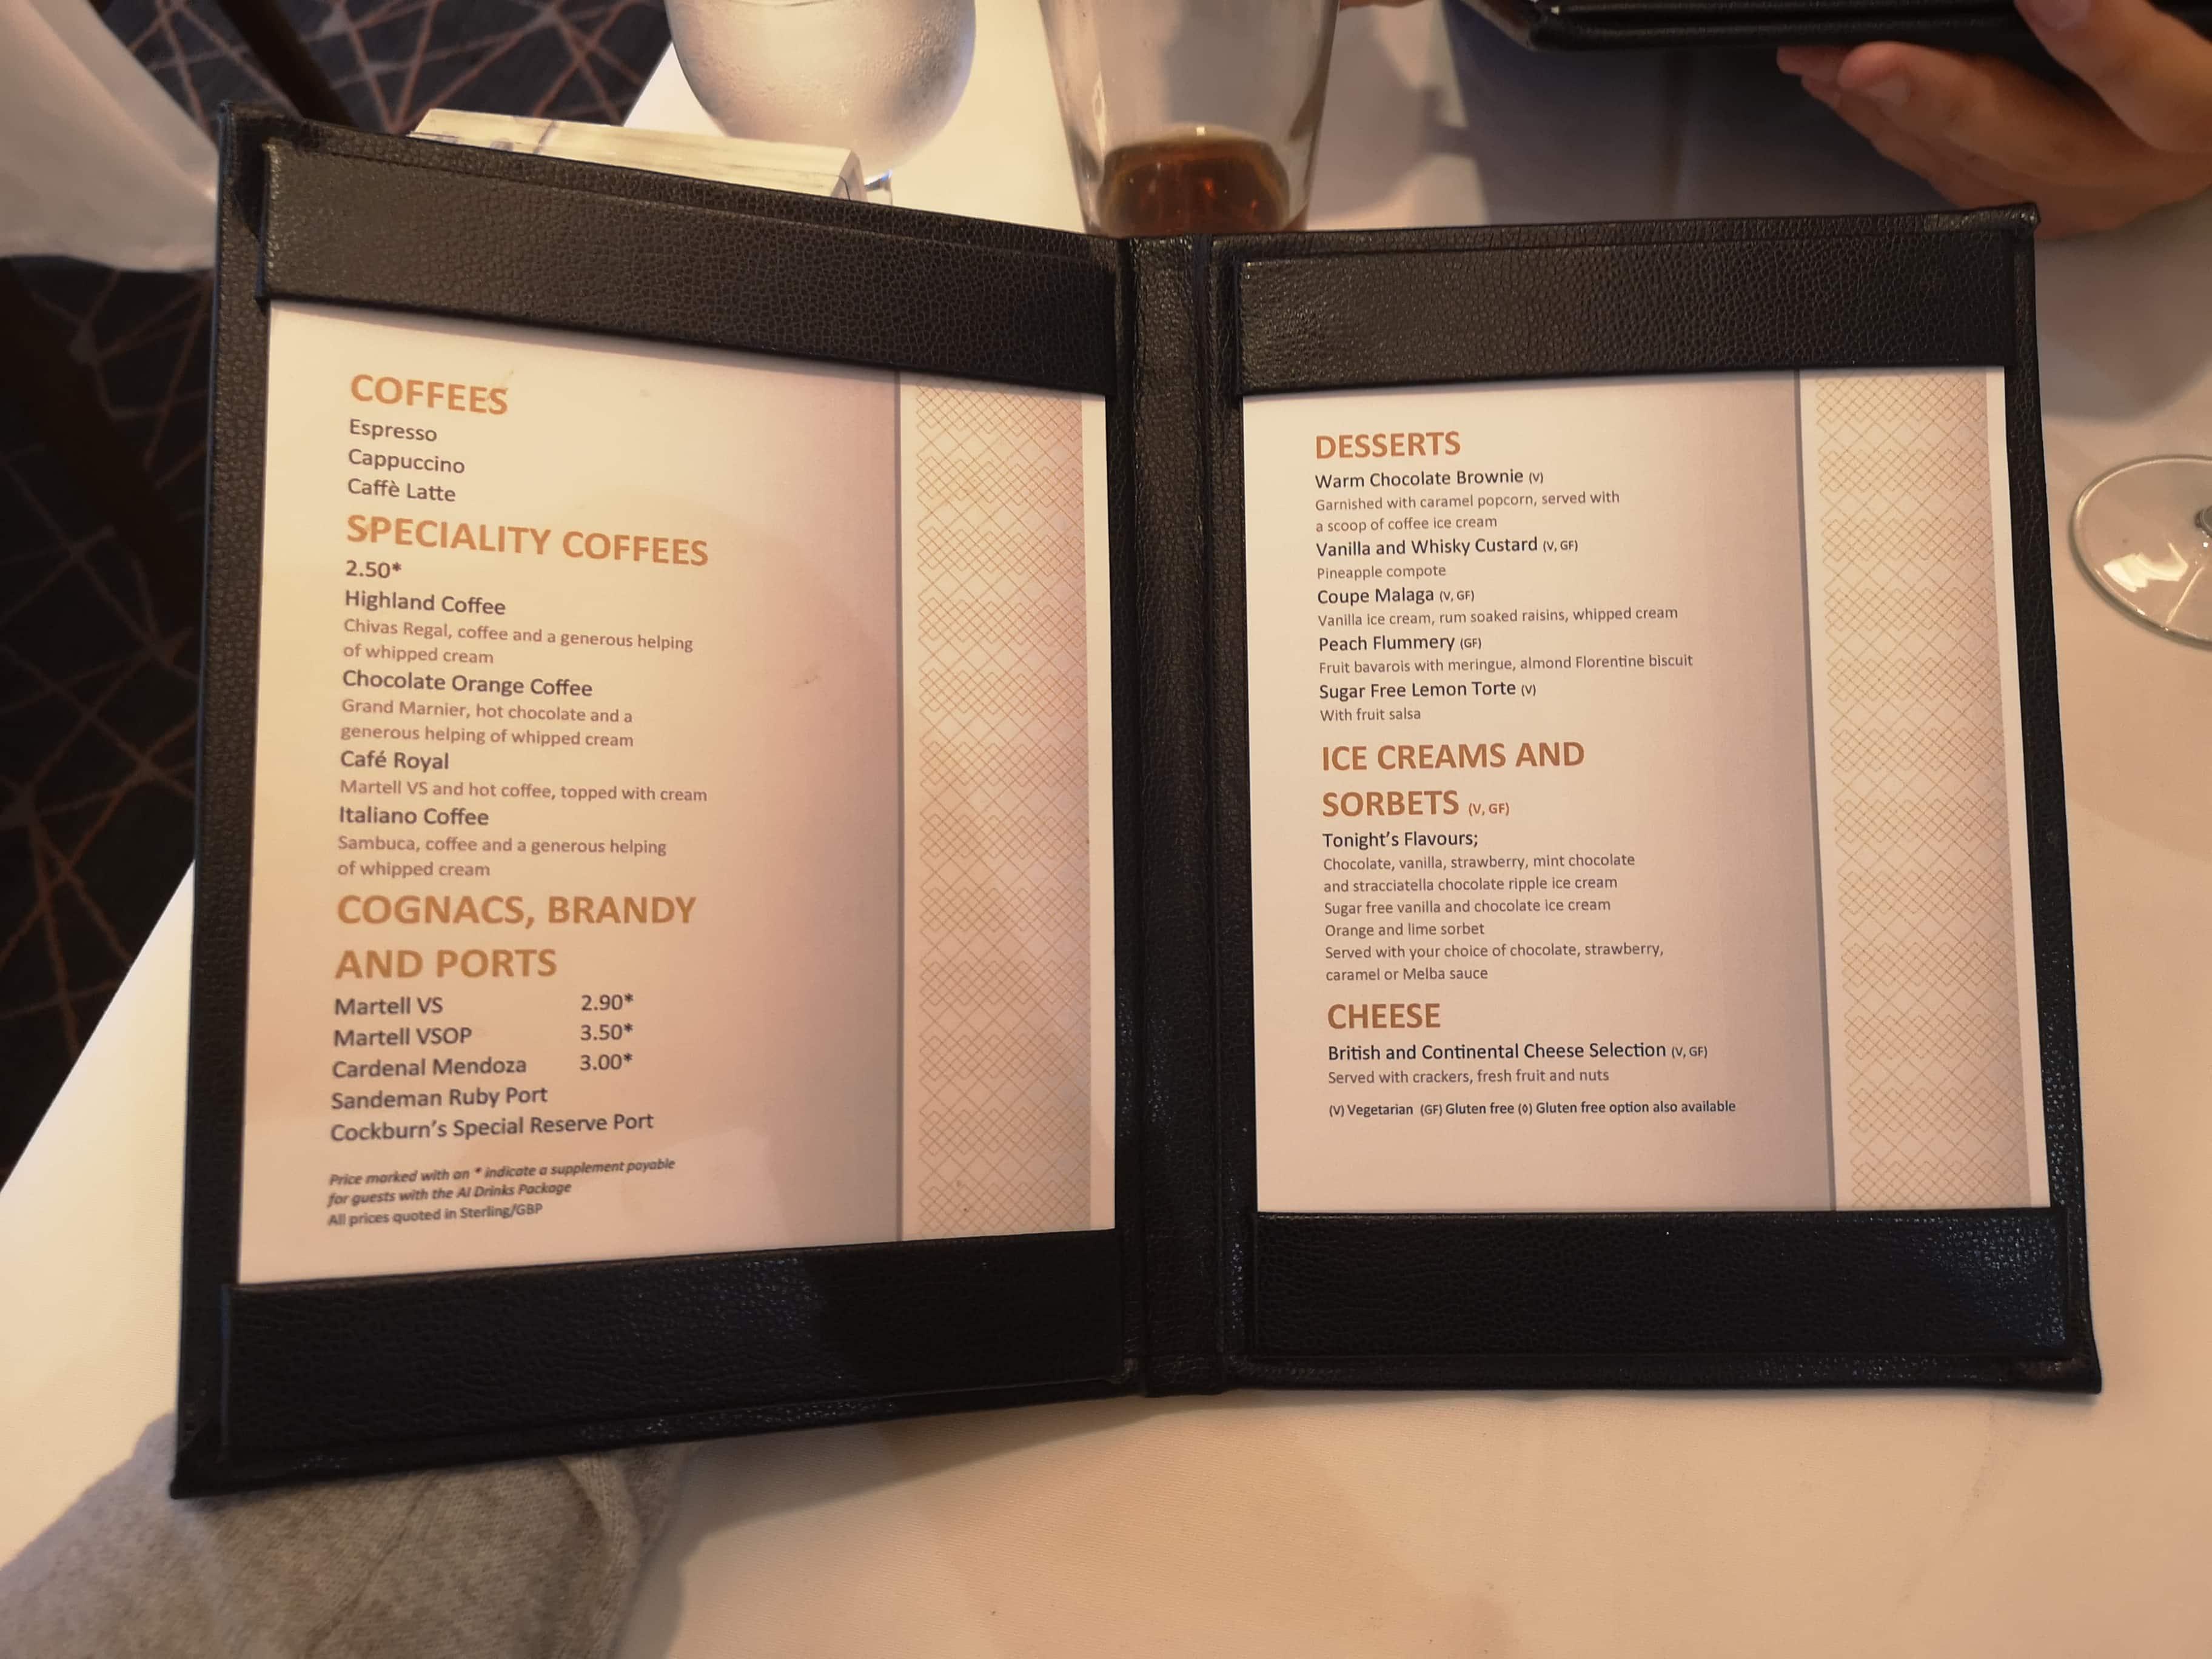 Marella Discovery Main Dining Room Dessert Menu  Coffee Ice creams and sorbets